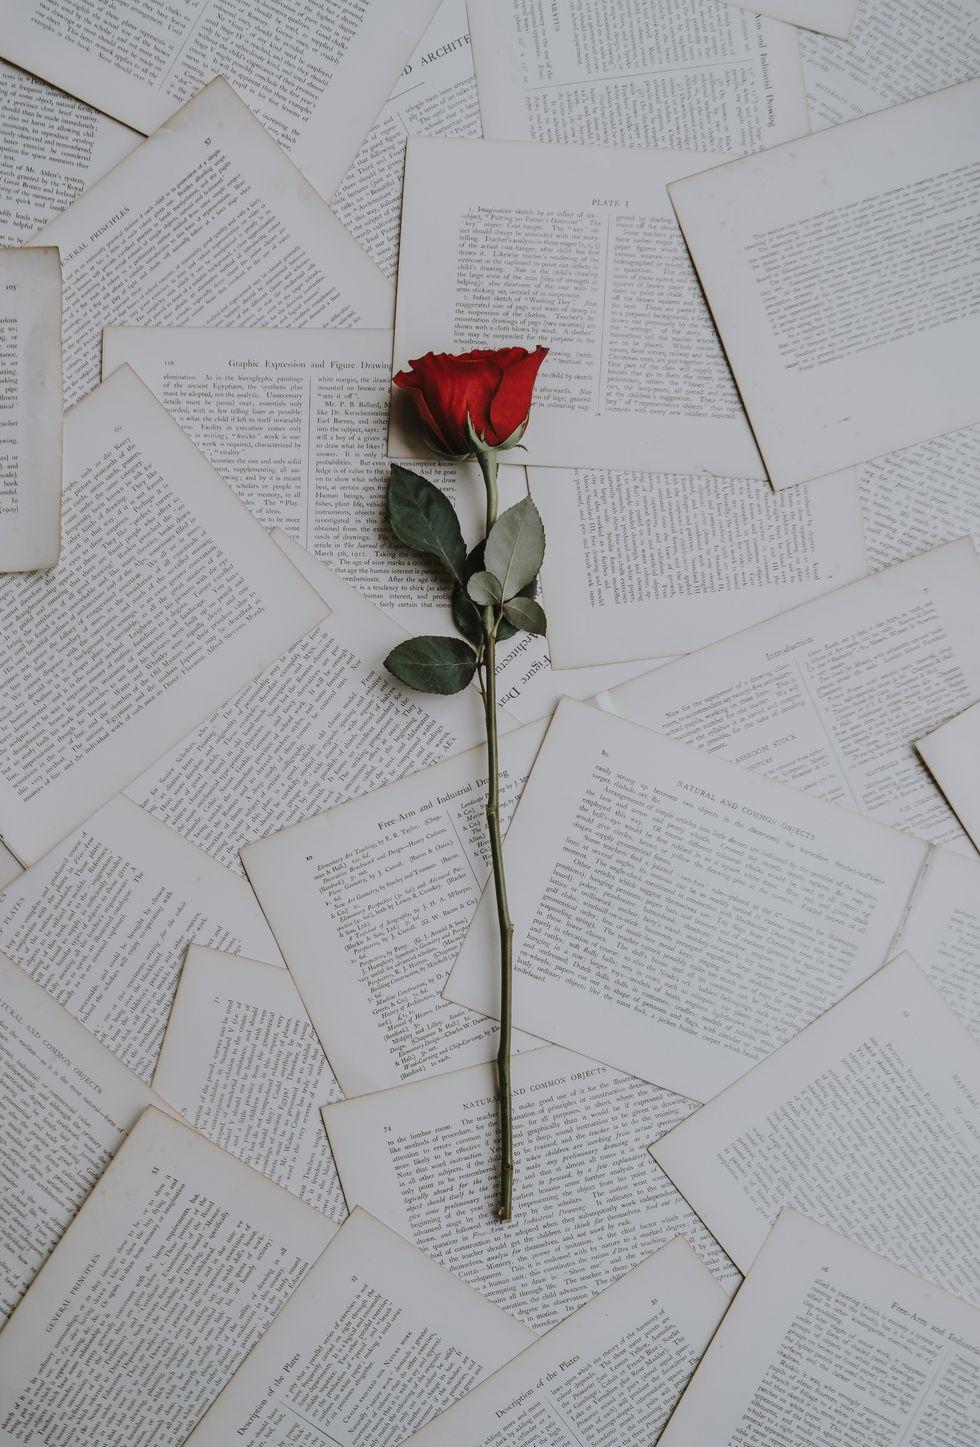 Poetry On Odyssey: Fallin'